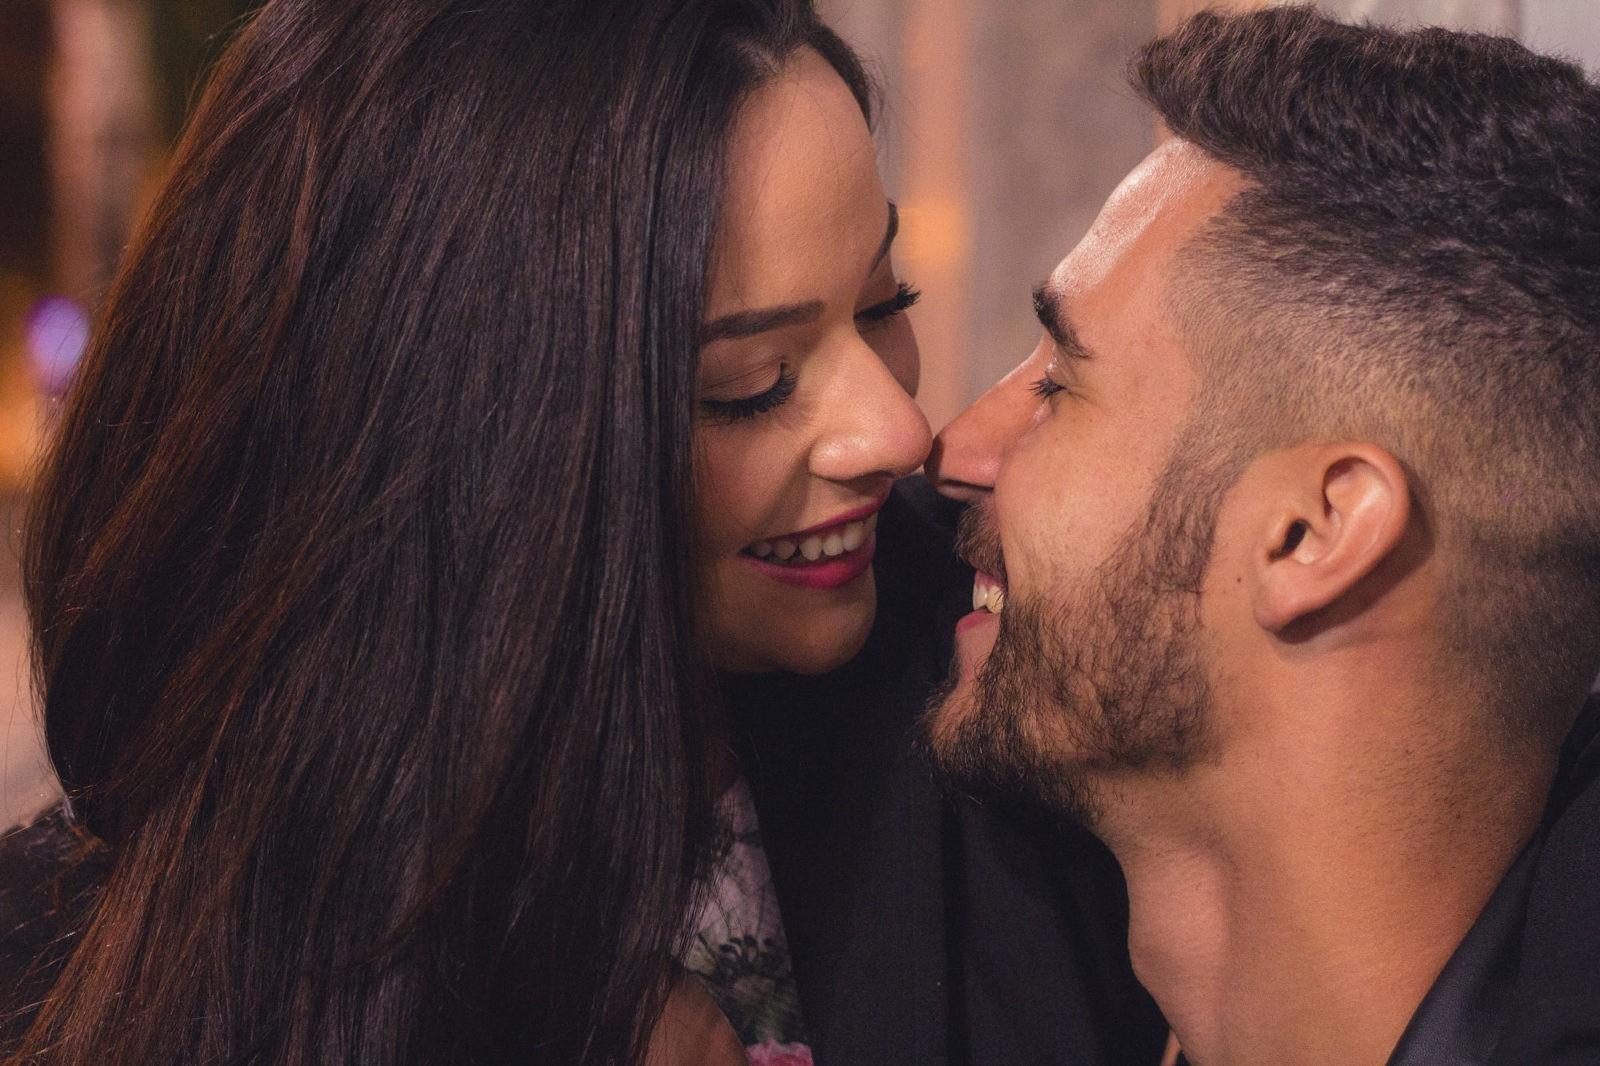 Мужчина и женщина в Бразилии